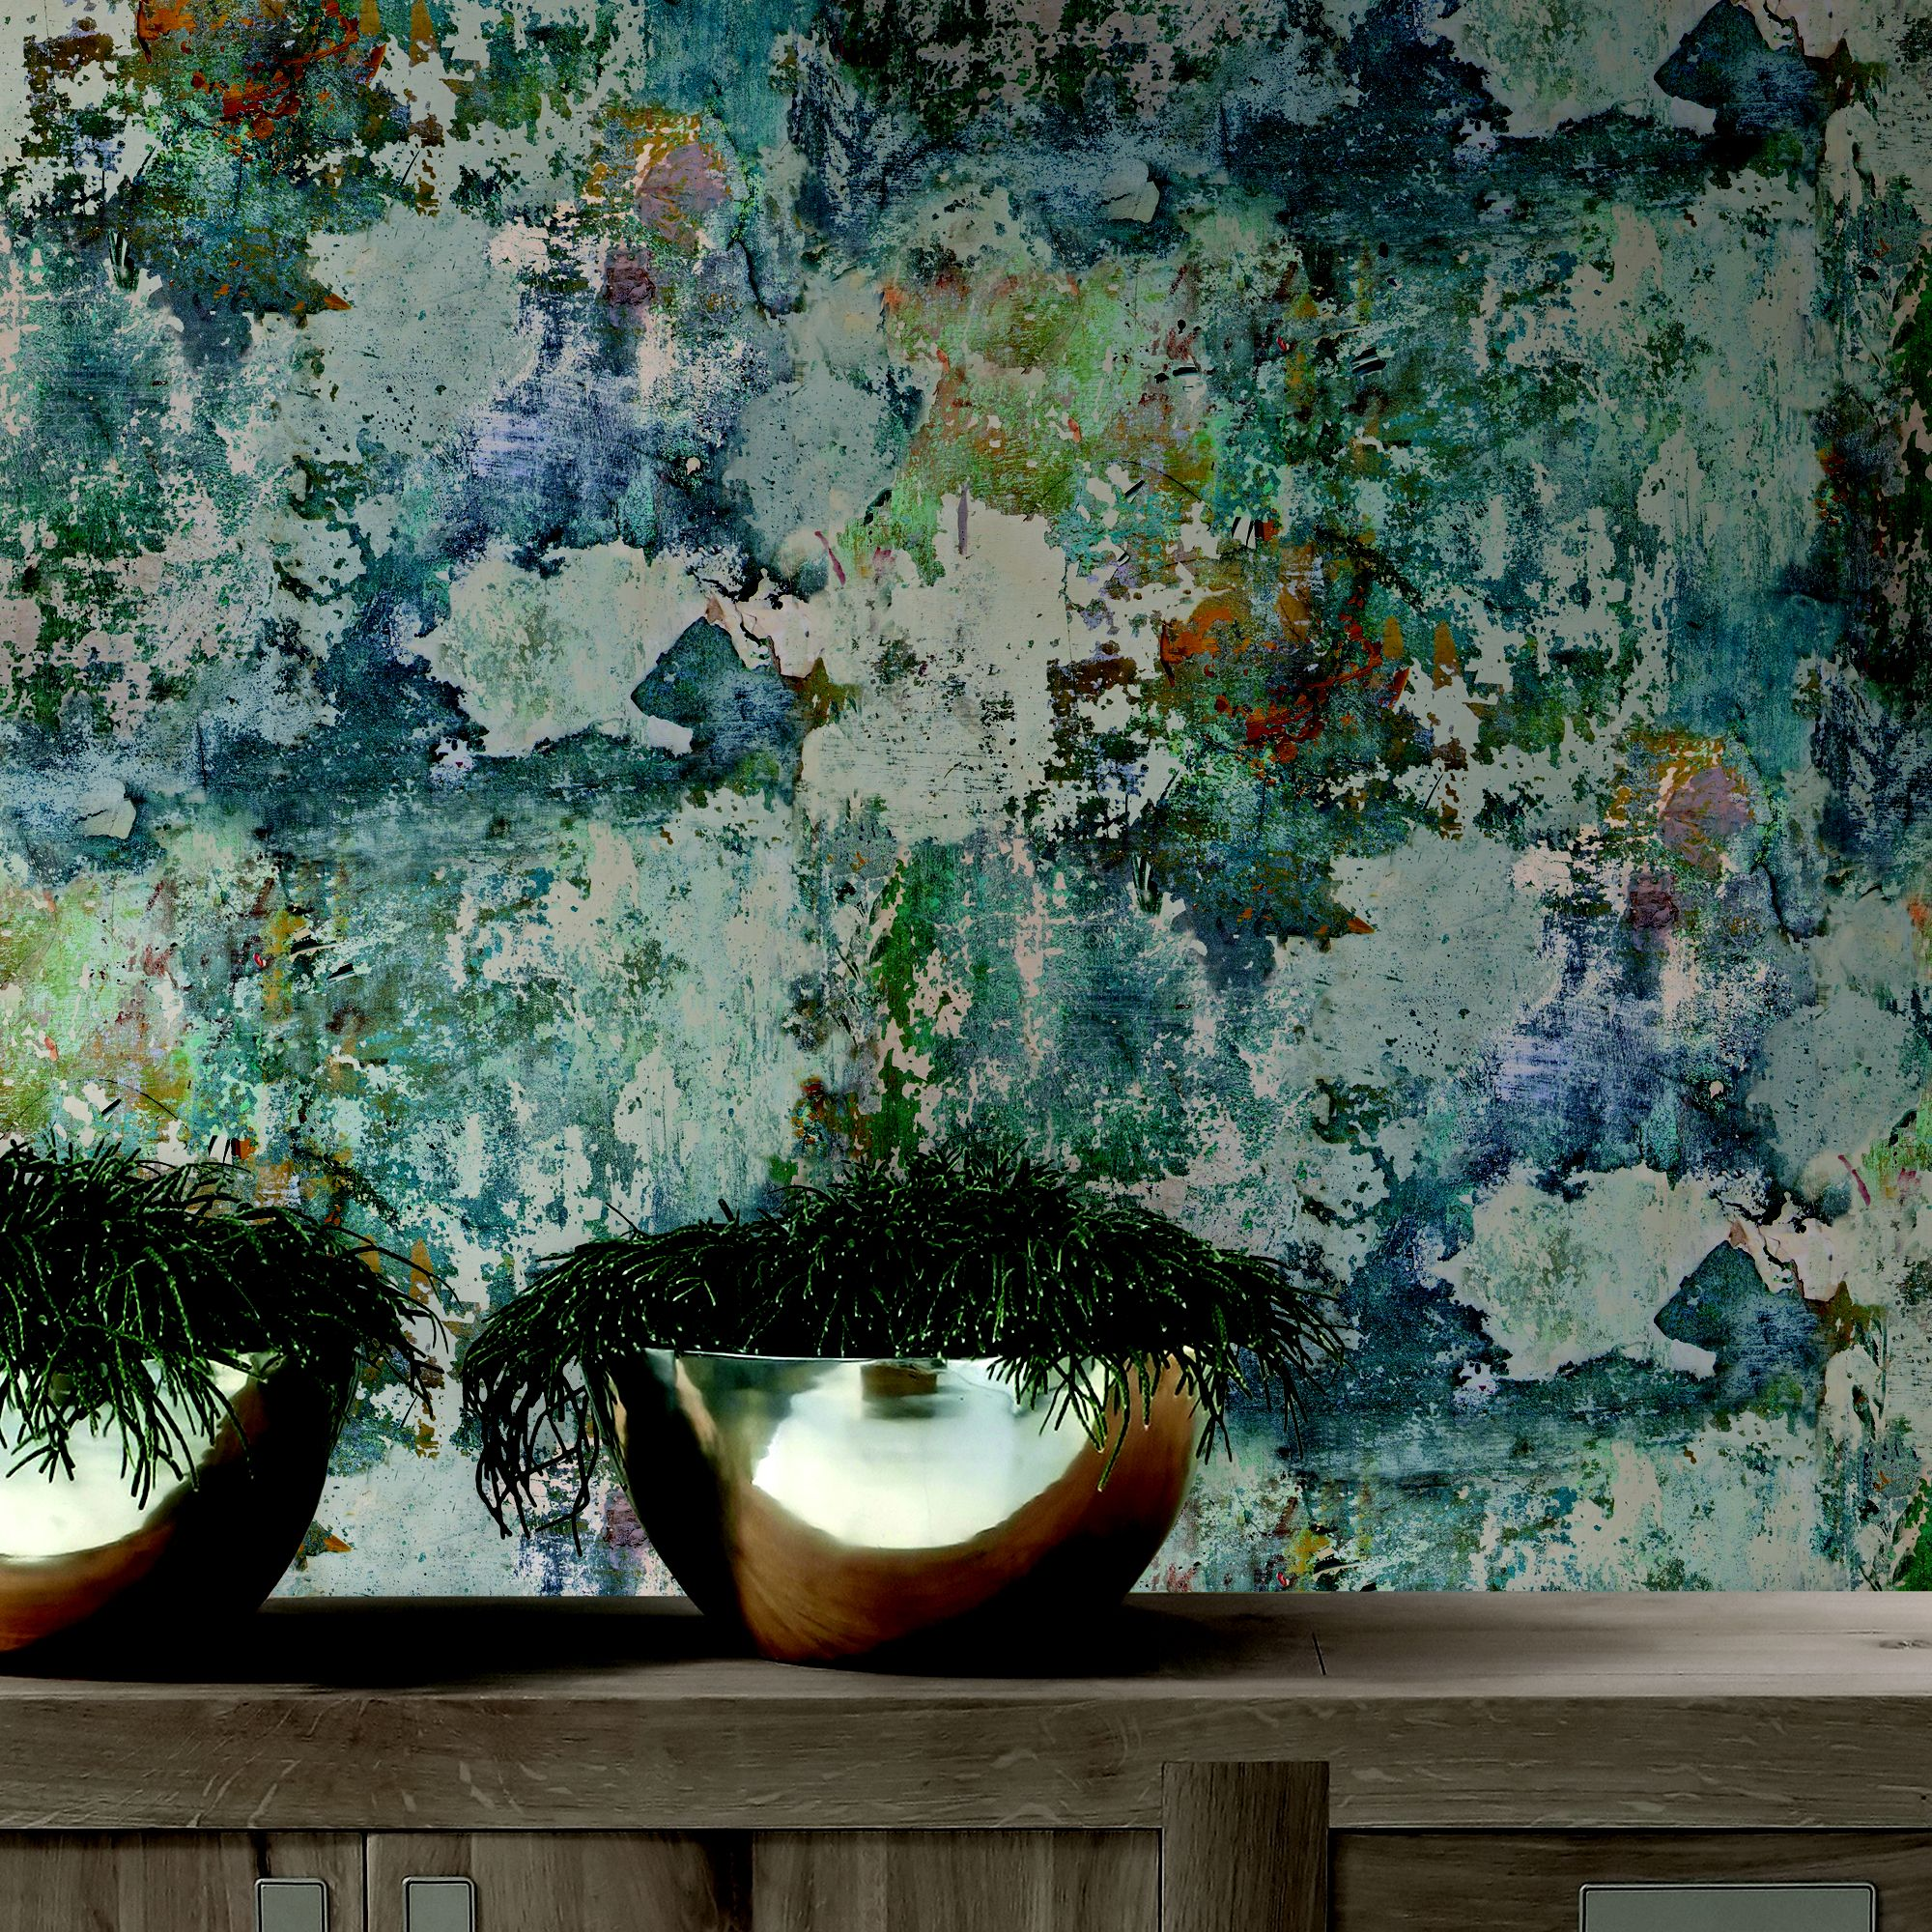 Goodhome Nivosa Teal Coloured Concrete Imitation Wallpaper